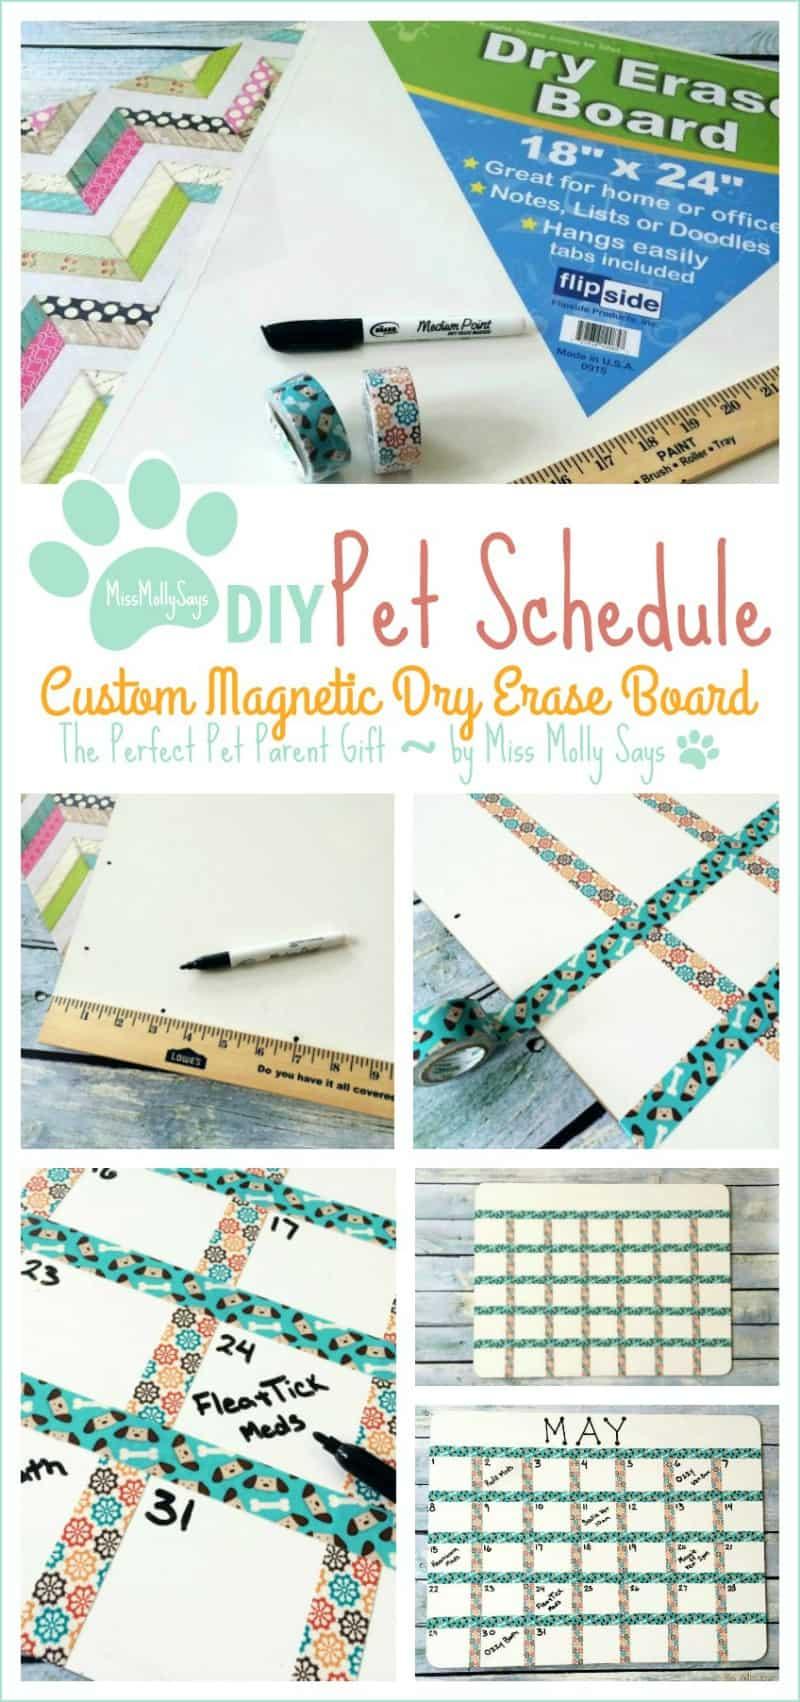 DIY Pet Schedule Custom Magnetic Dry Erase Board